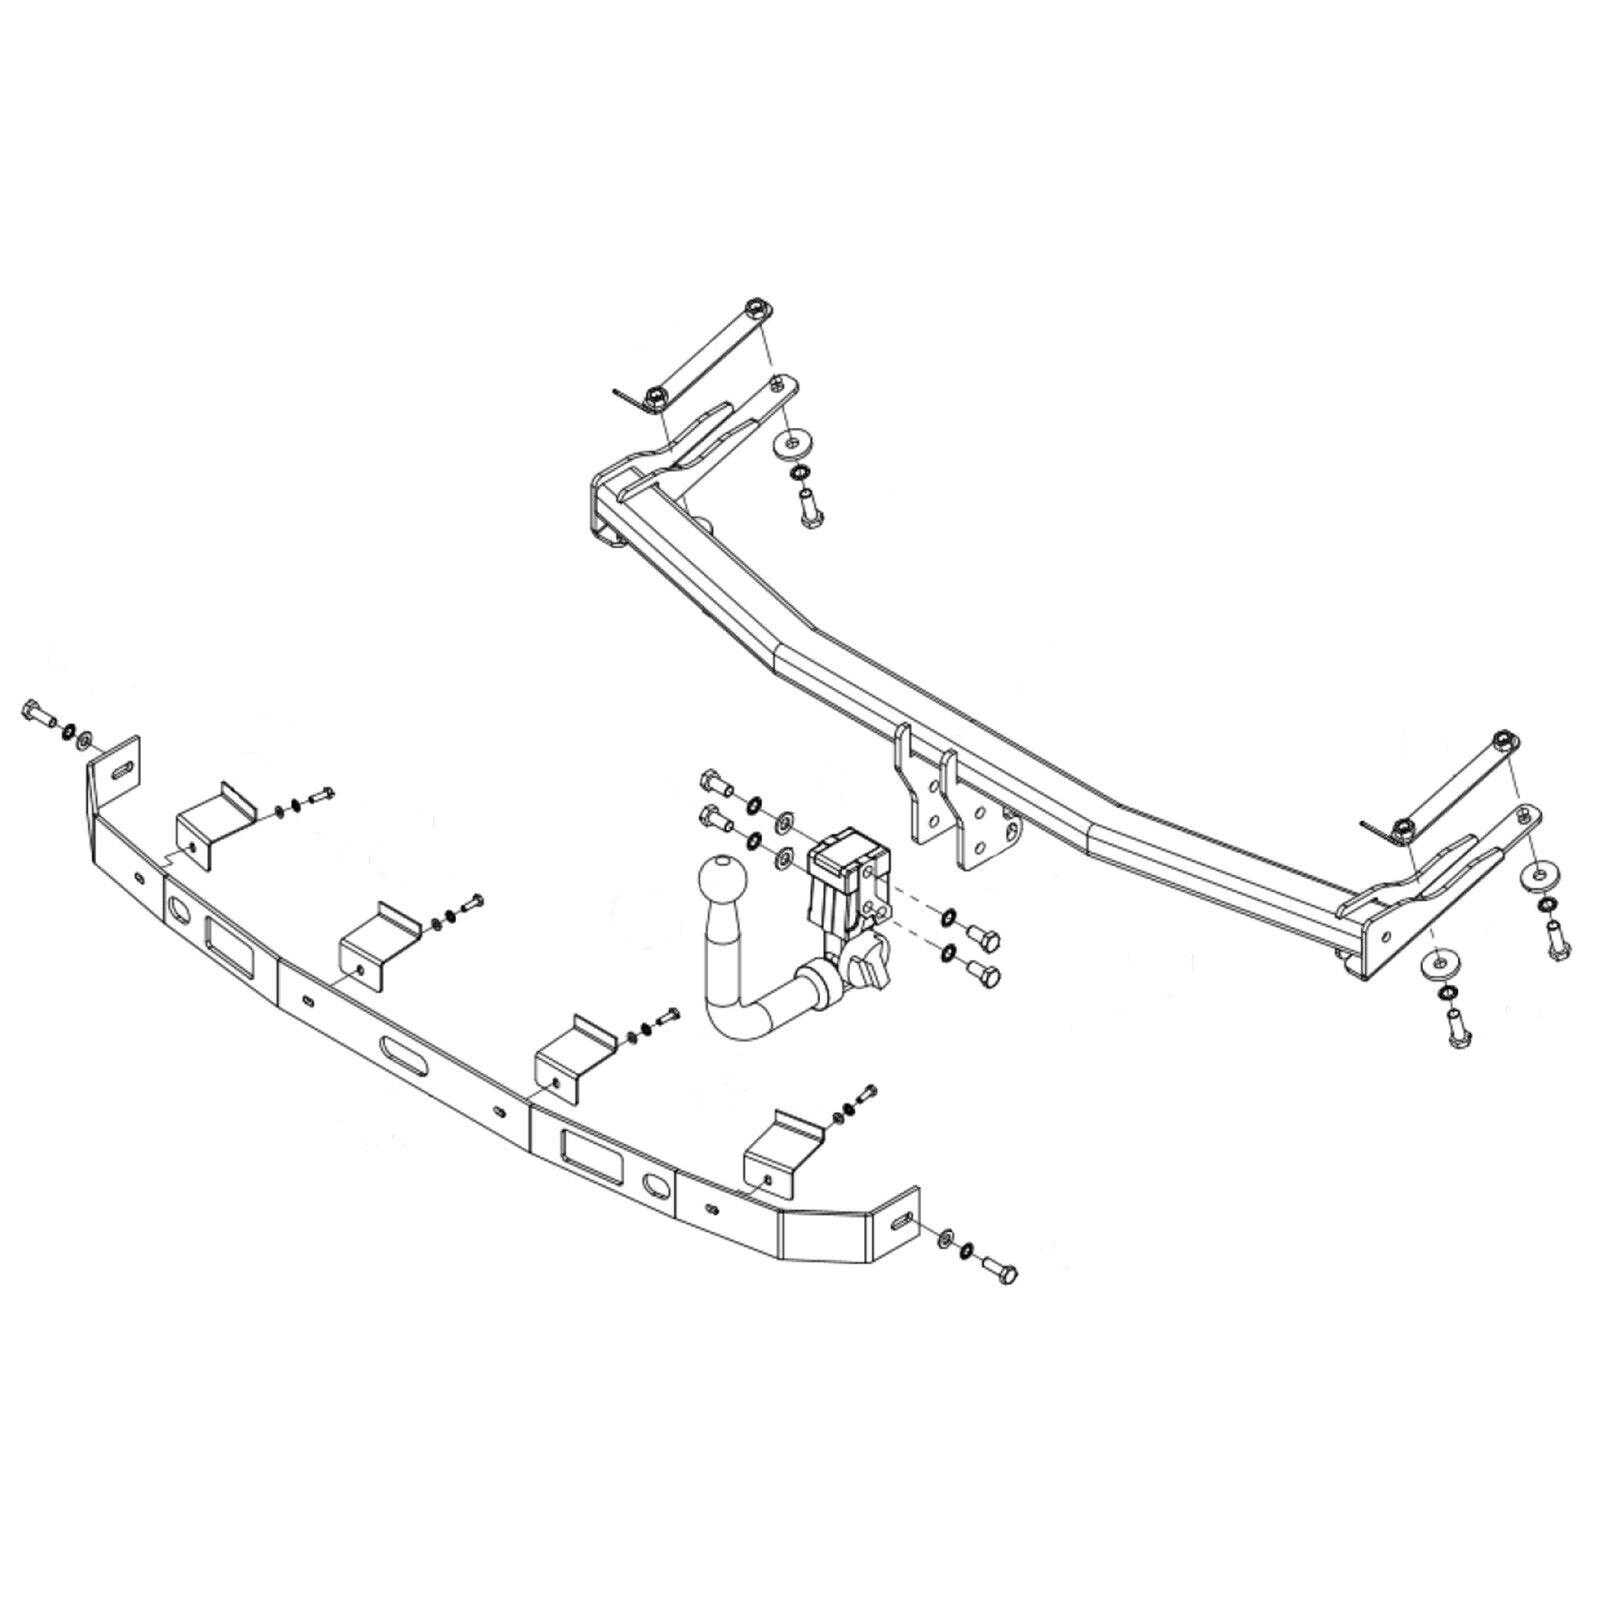 Flange Tow Bar Brink Towbar for Volkswagen Caddy Van Mk3 2004-2015